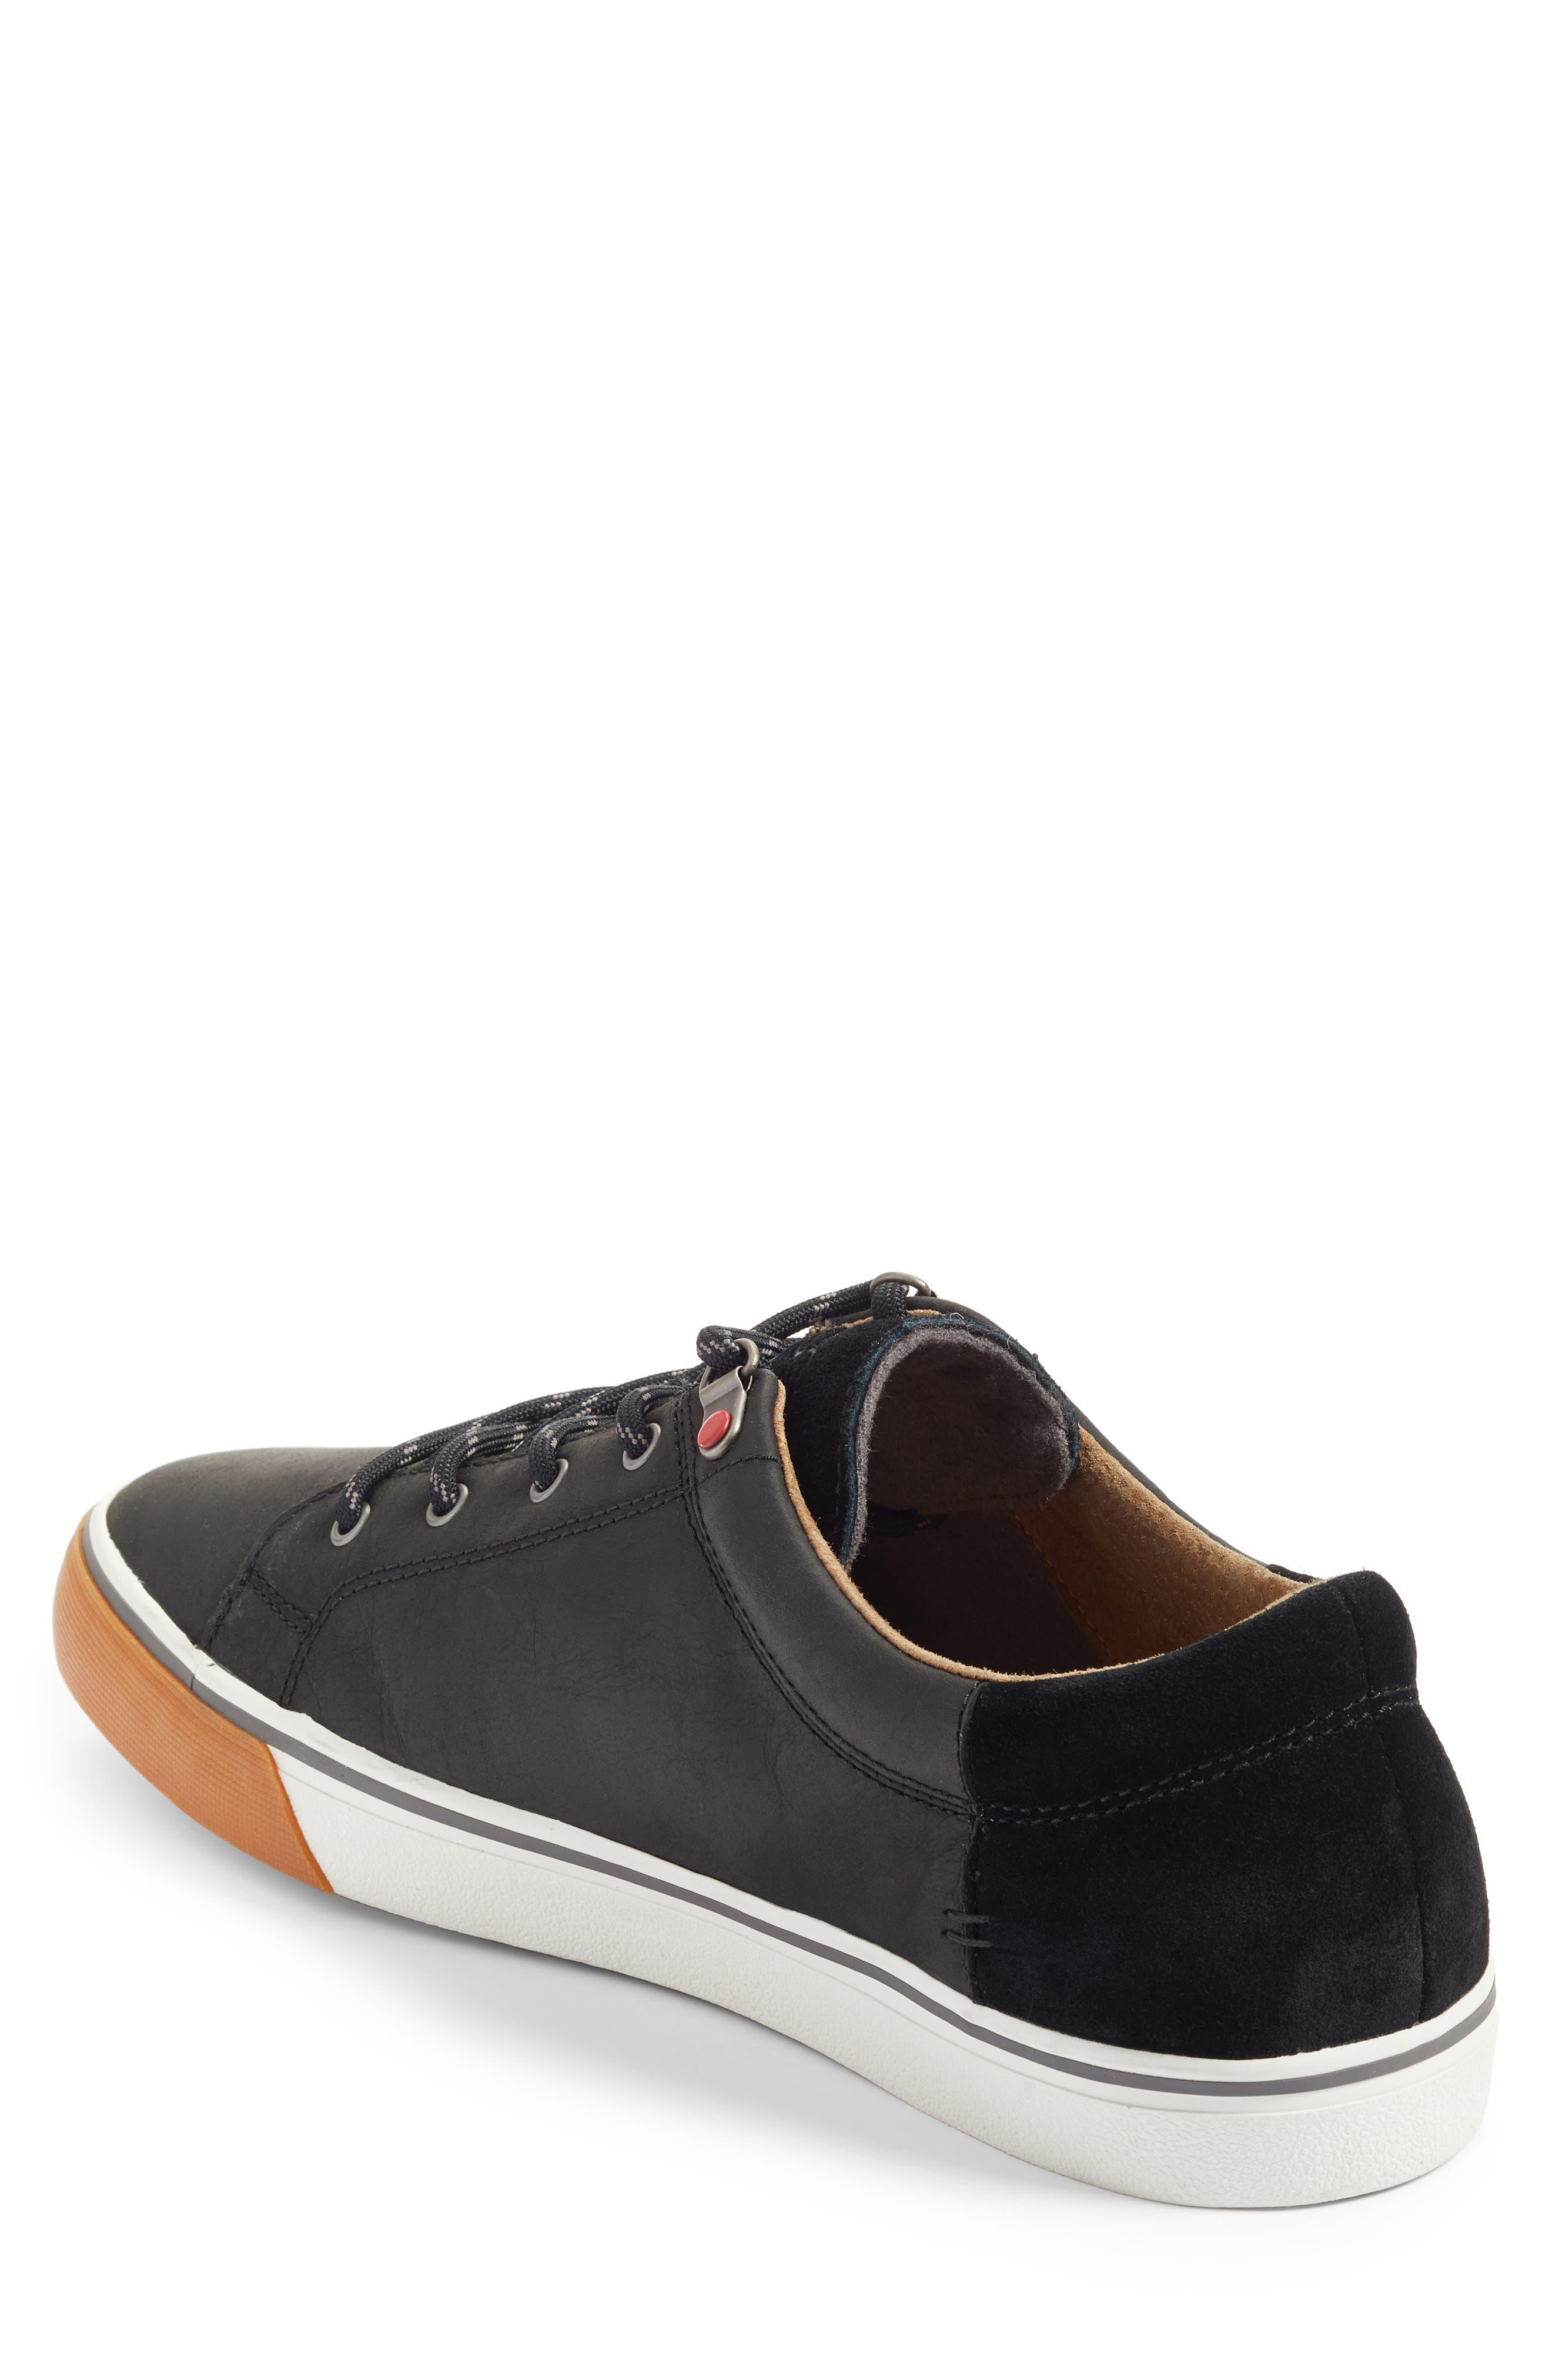 Brock Sneaker,                             Alternate thumbnail 2, color,                             001